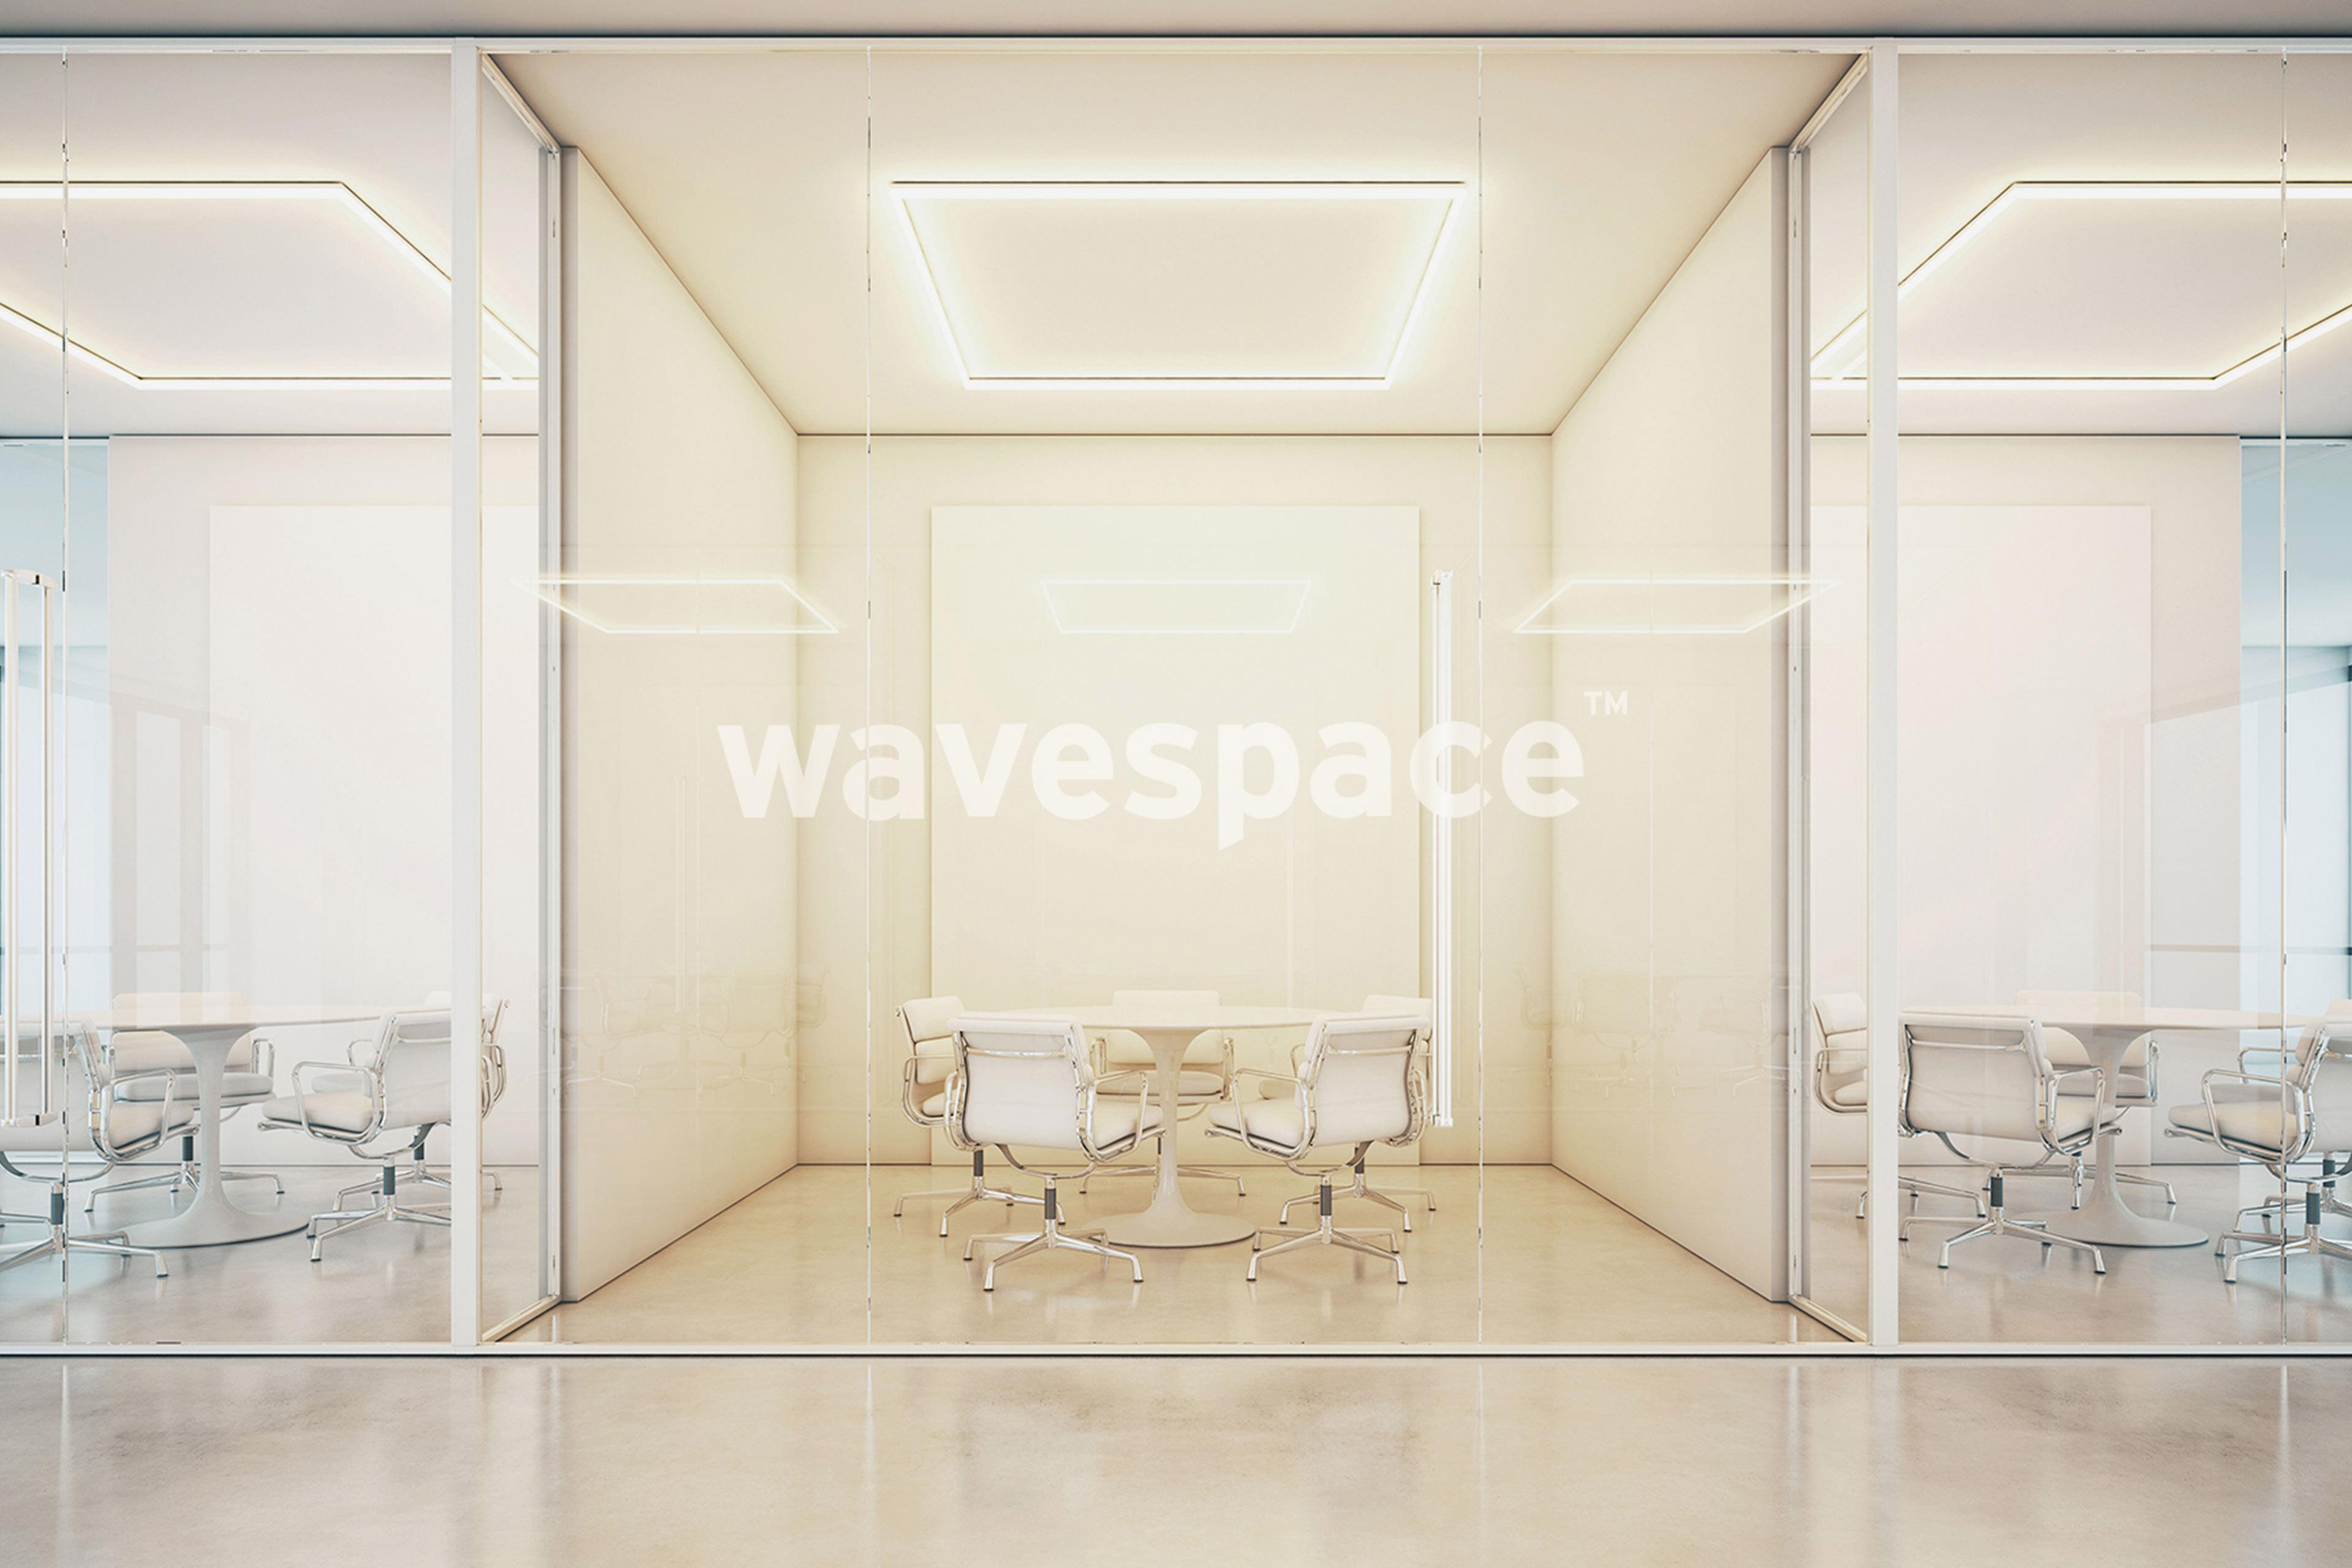 EY Wavespace office